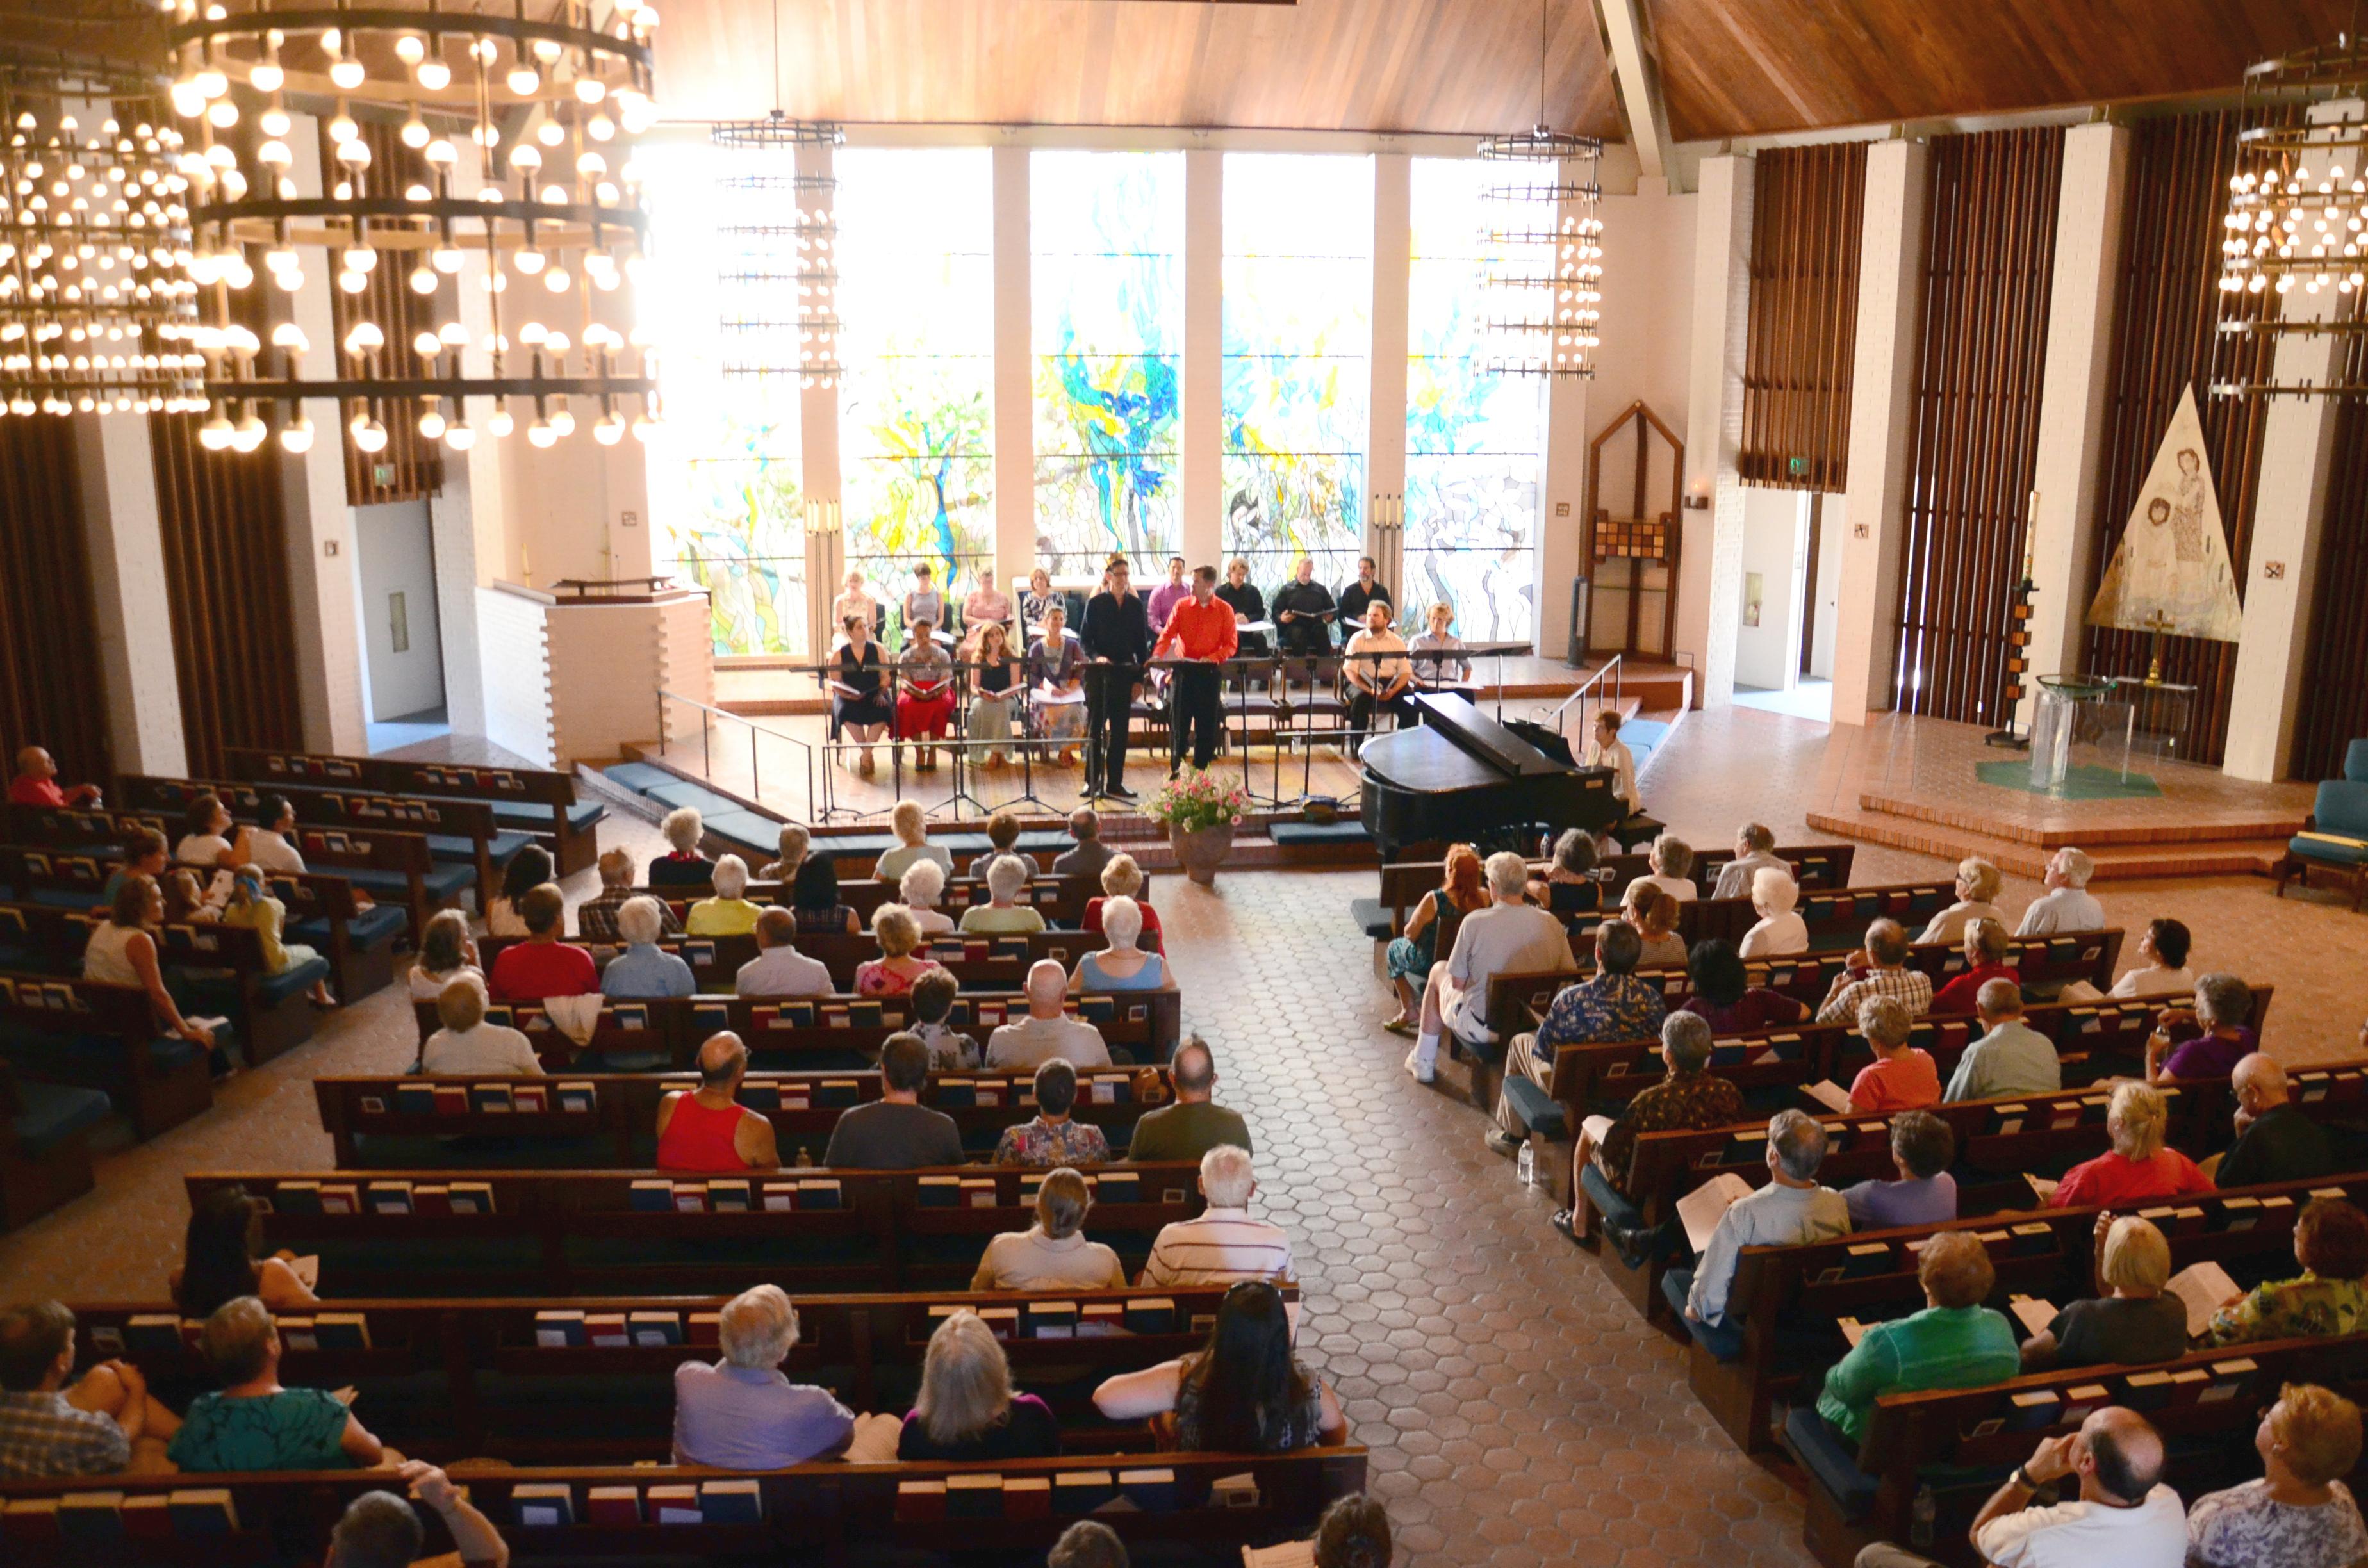 Beautiful All Souls' Church